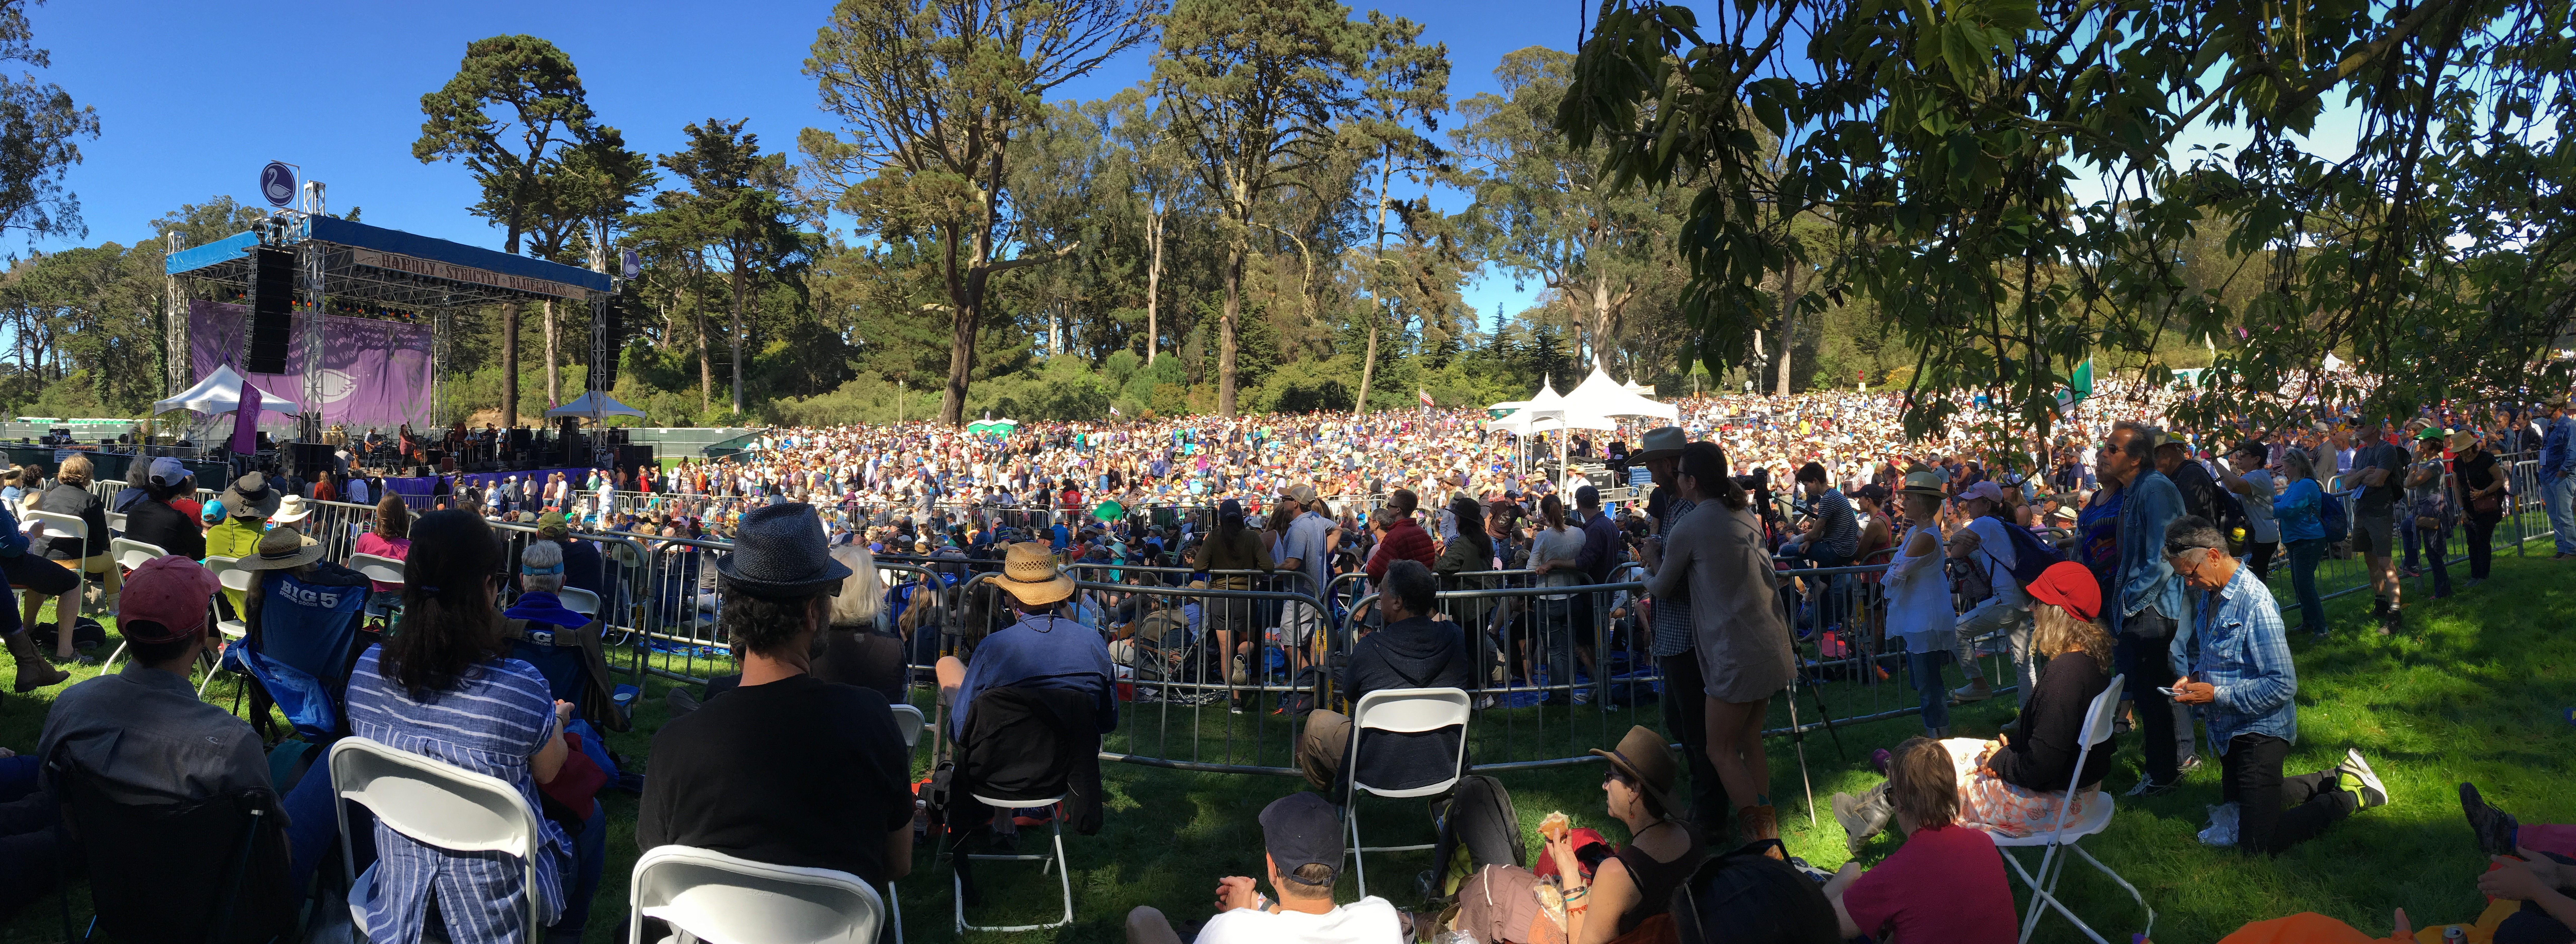 The crowd for Wailin' Jenny's